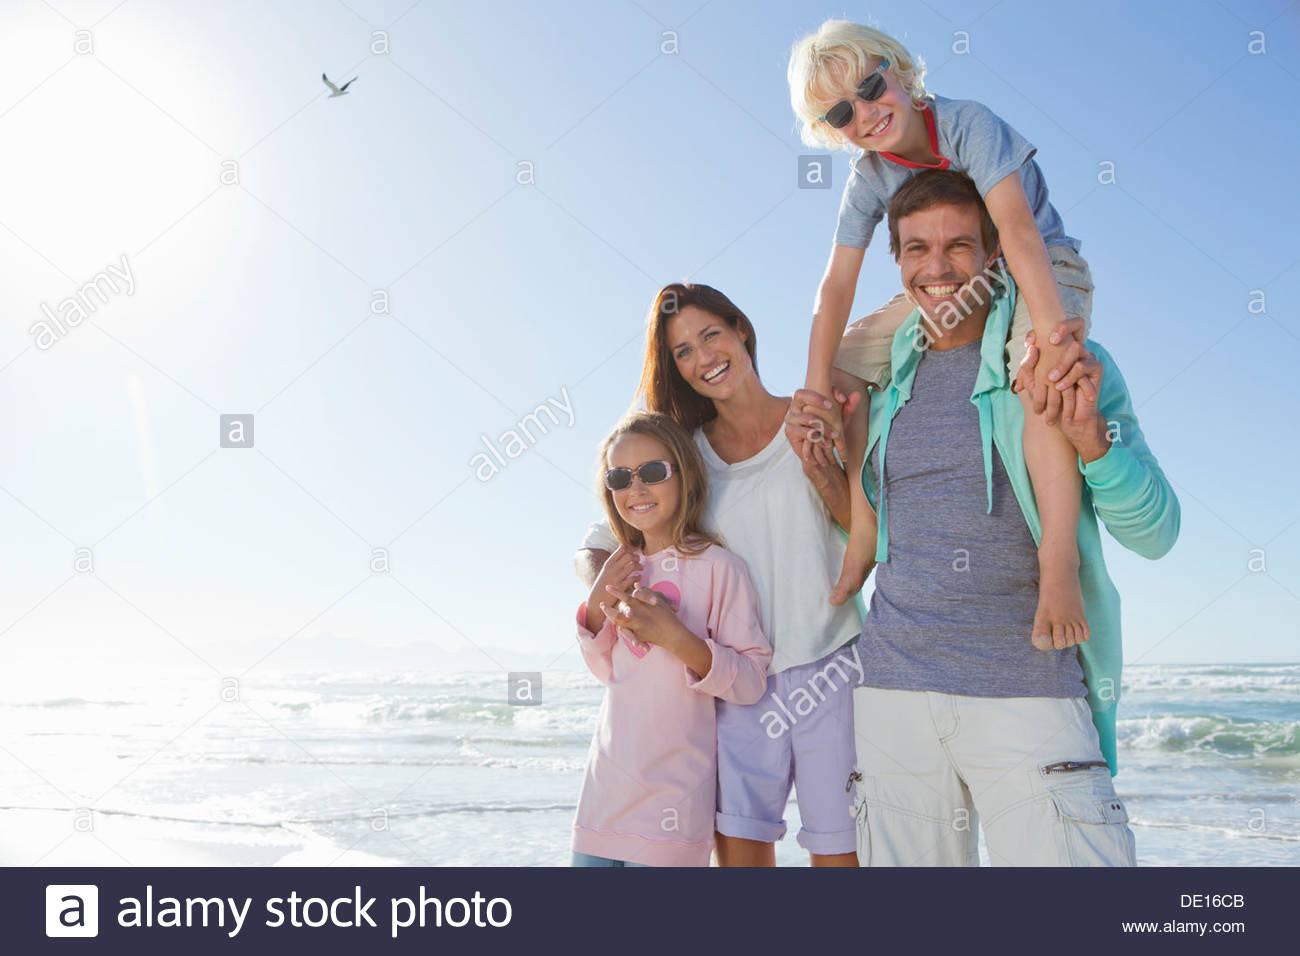 Portrait of happy family on sunny beach - Stock Image